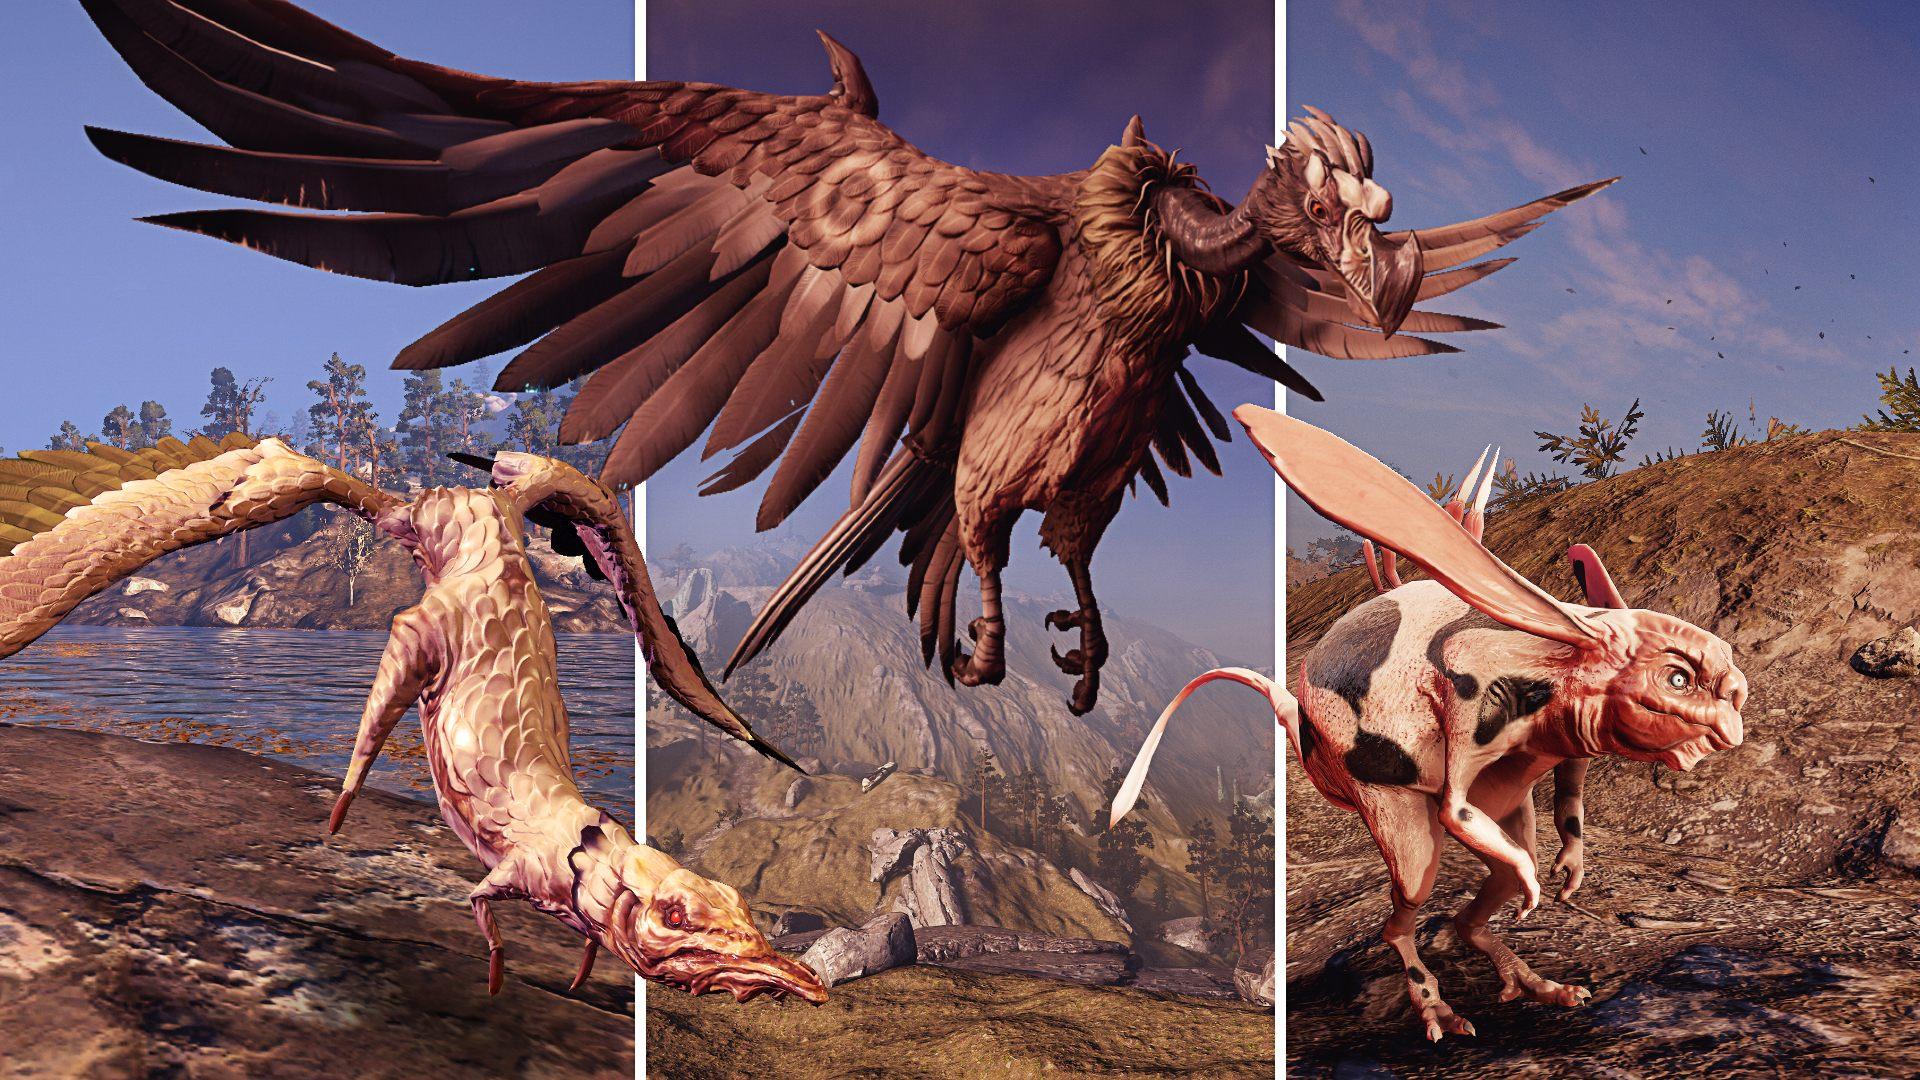 Warframe: Plains of Eidolon Remaster Update 24 6 0 - VG247